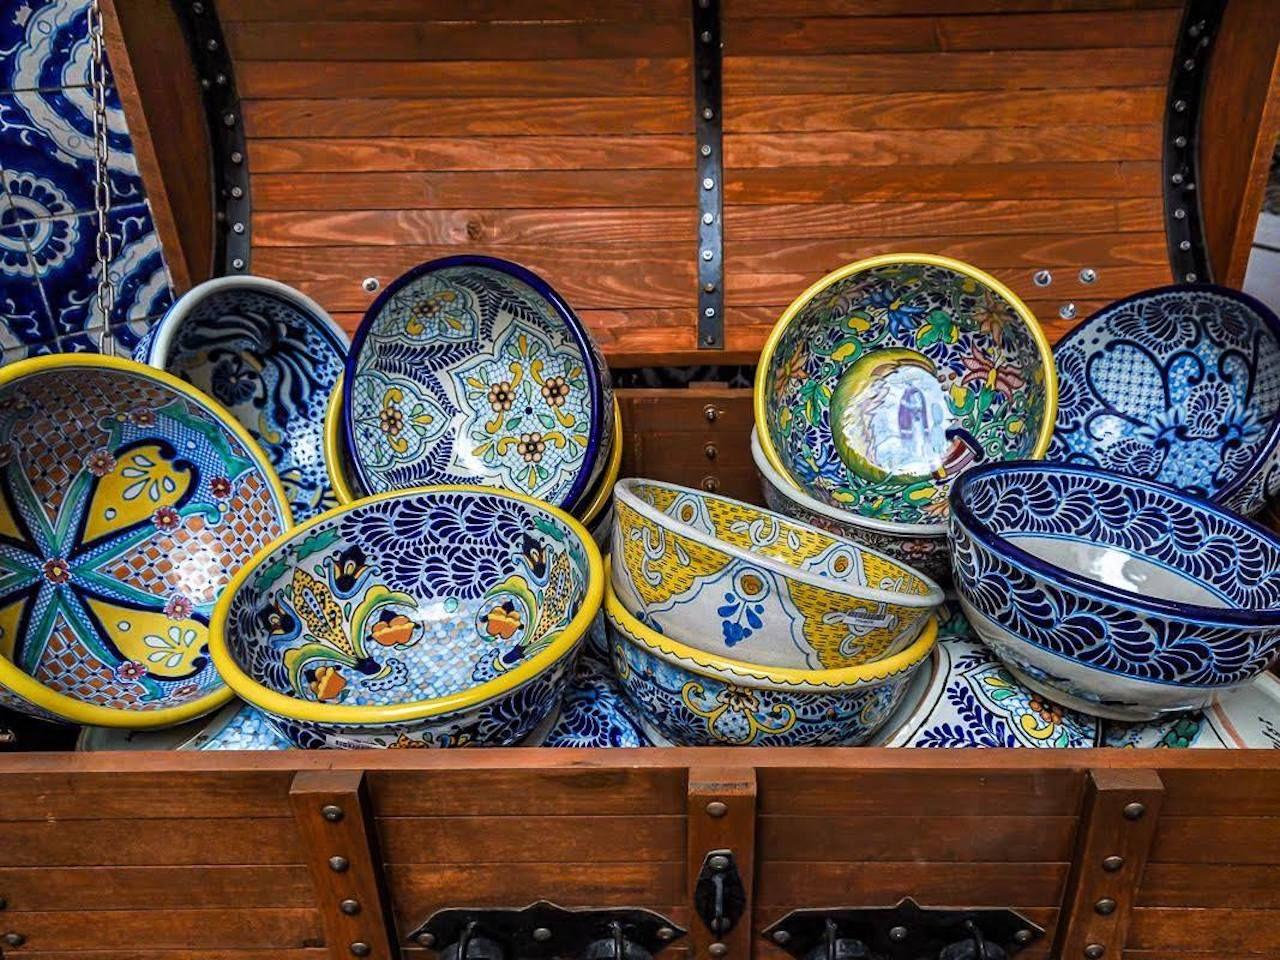 Talavera pottery made by Mexican artisans